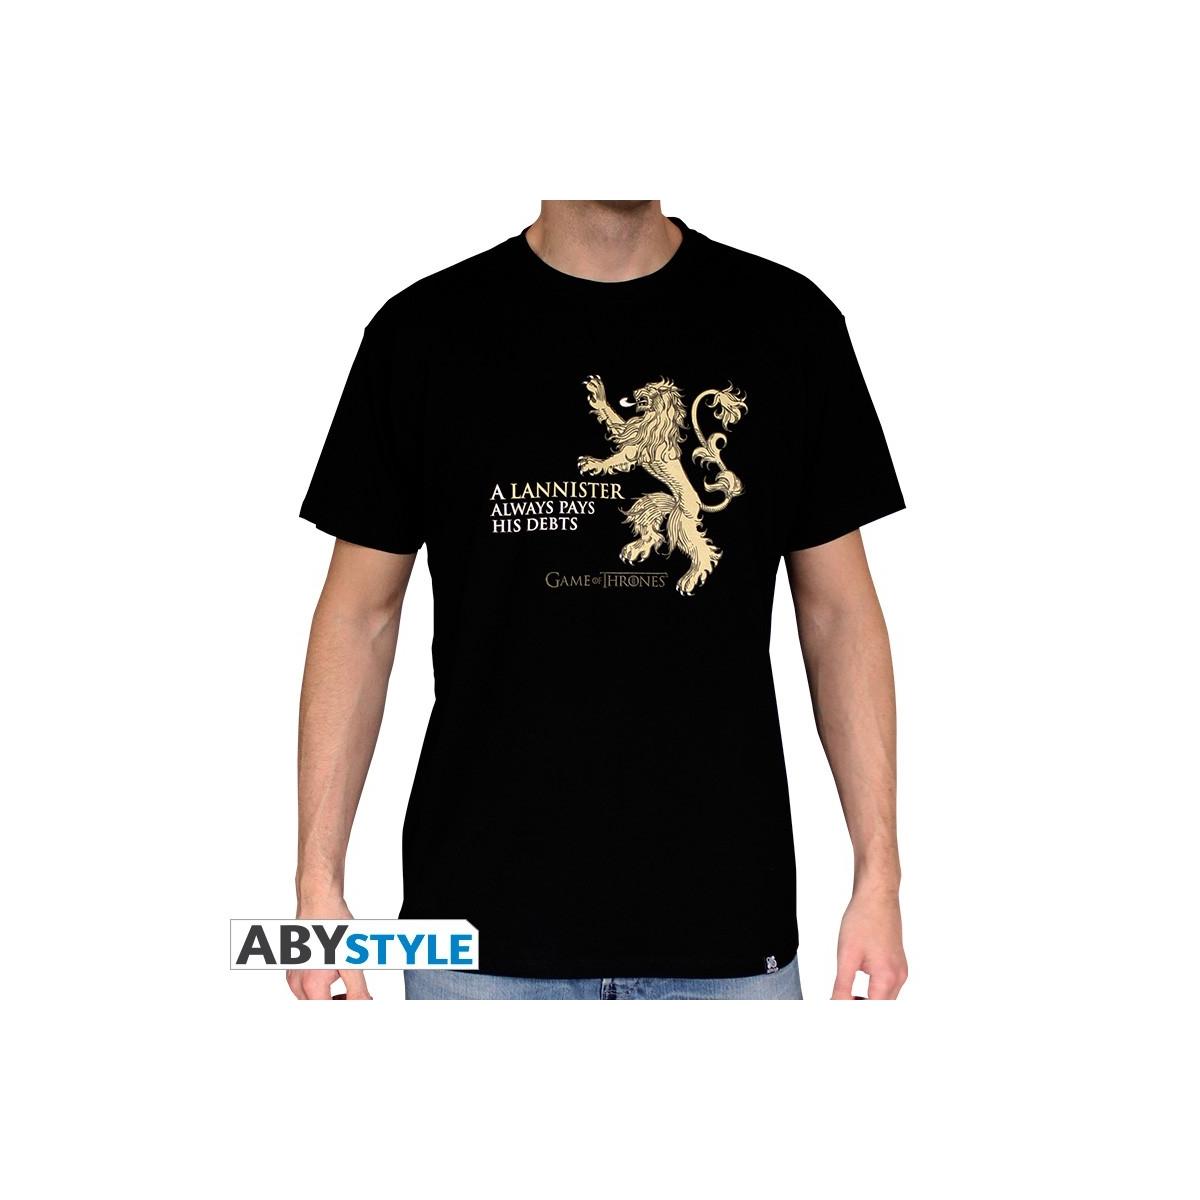 Carrelage Design tapis souris xxl : GAME OF THRONES - Tshirt Lannister homme MC black - basic ...